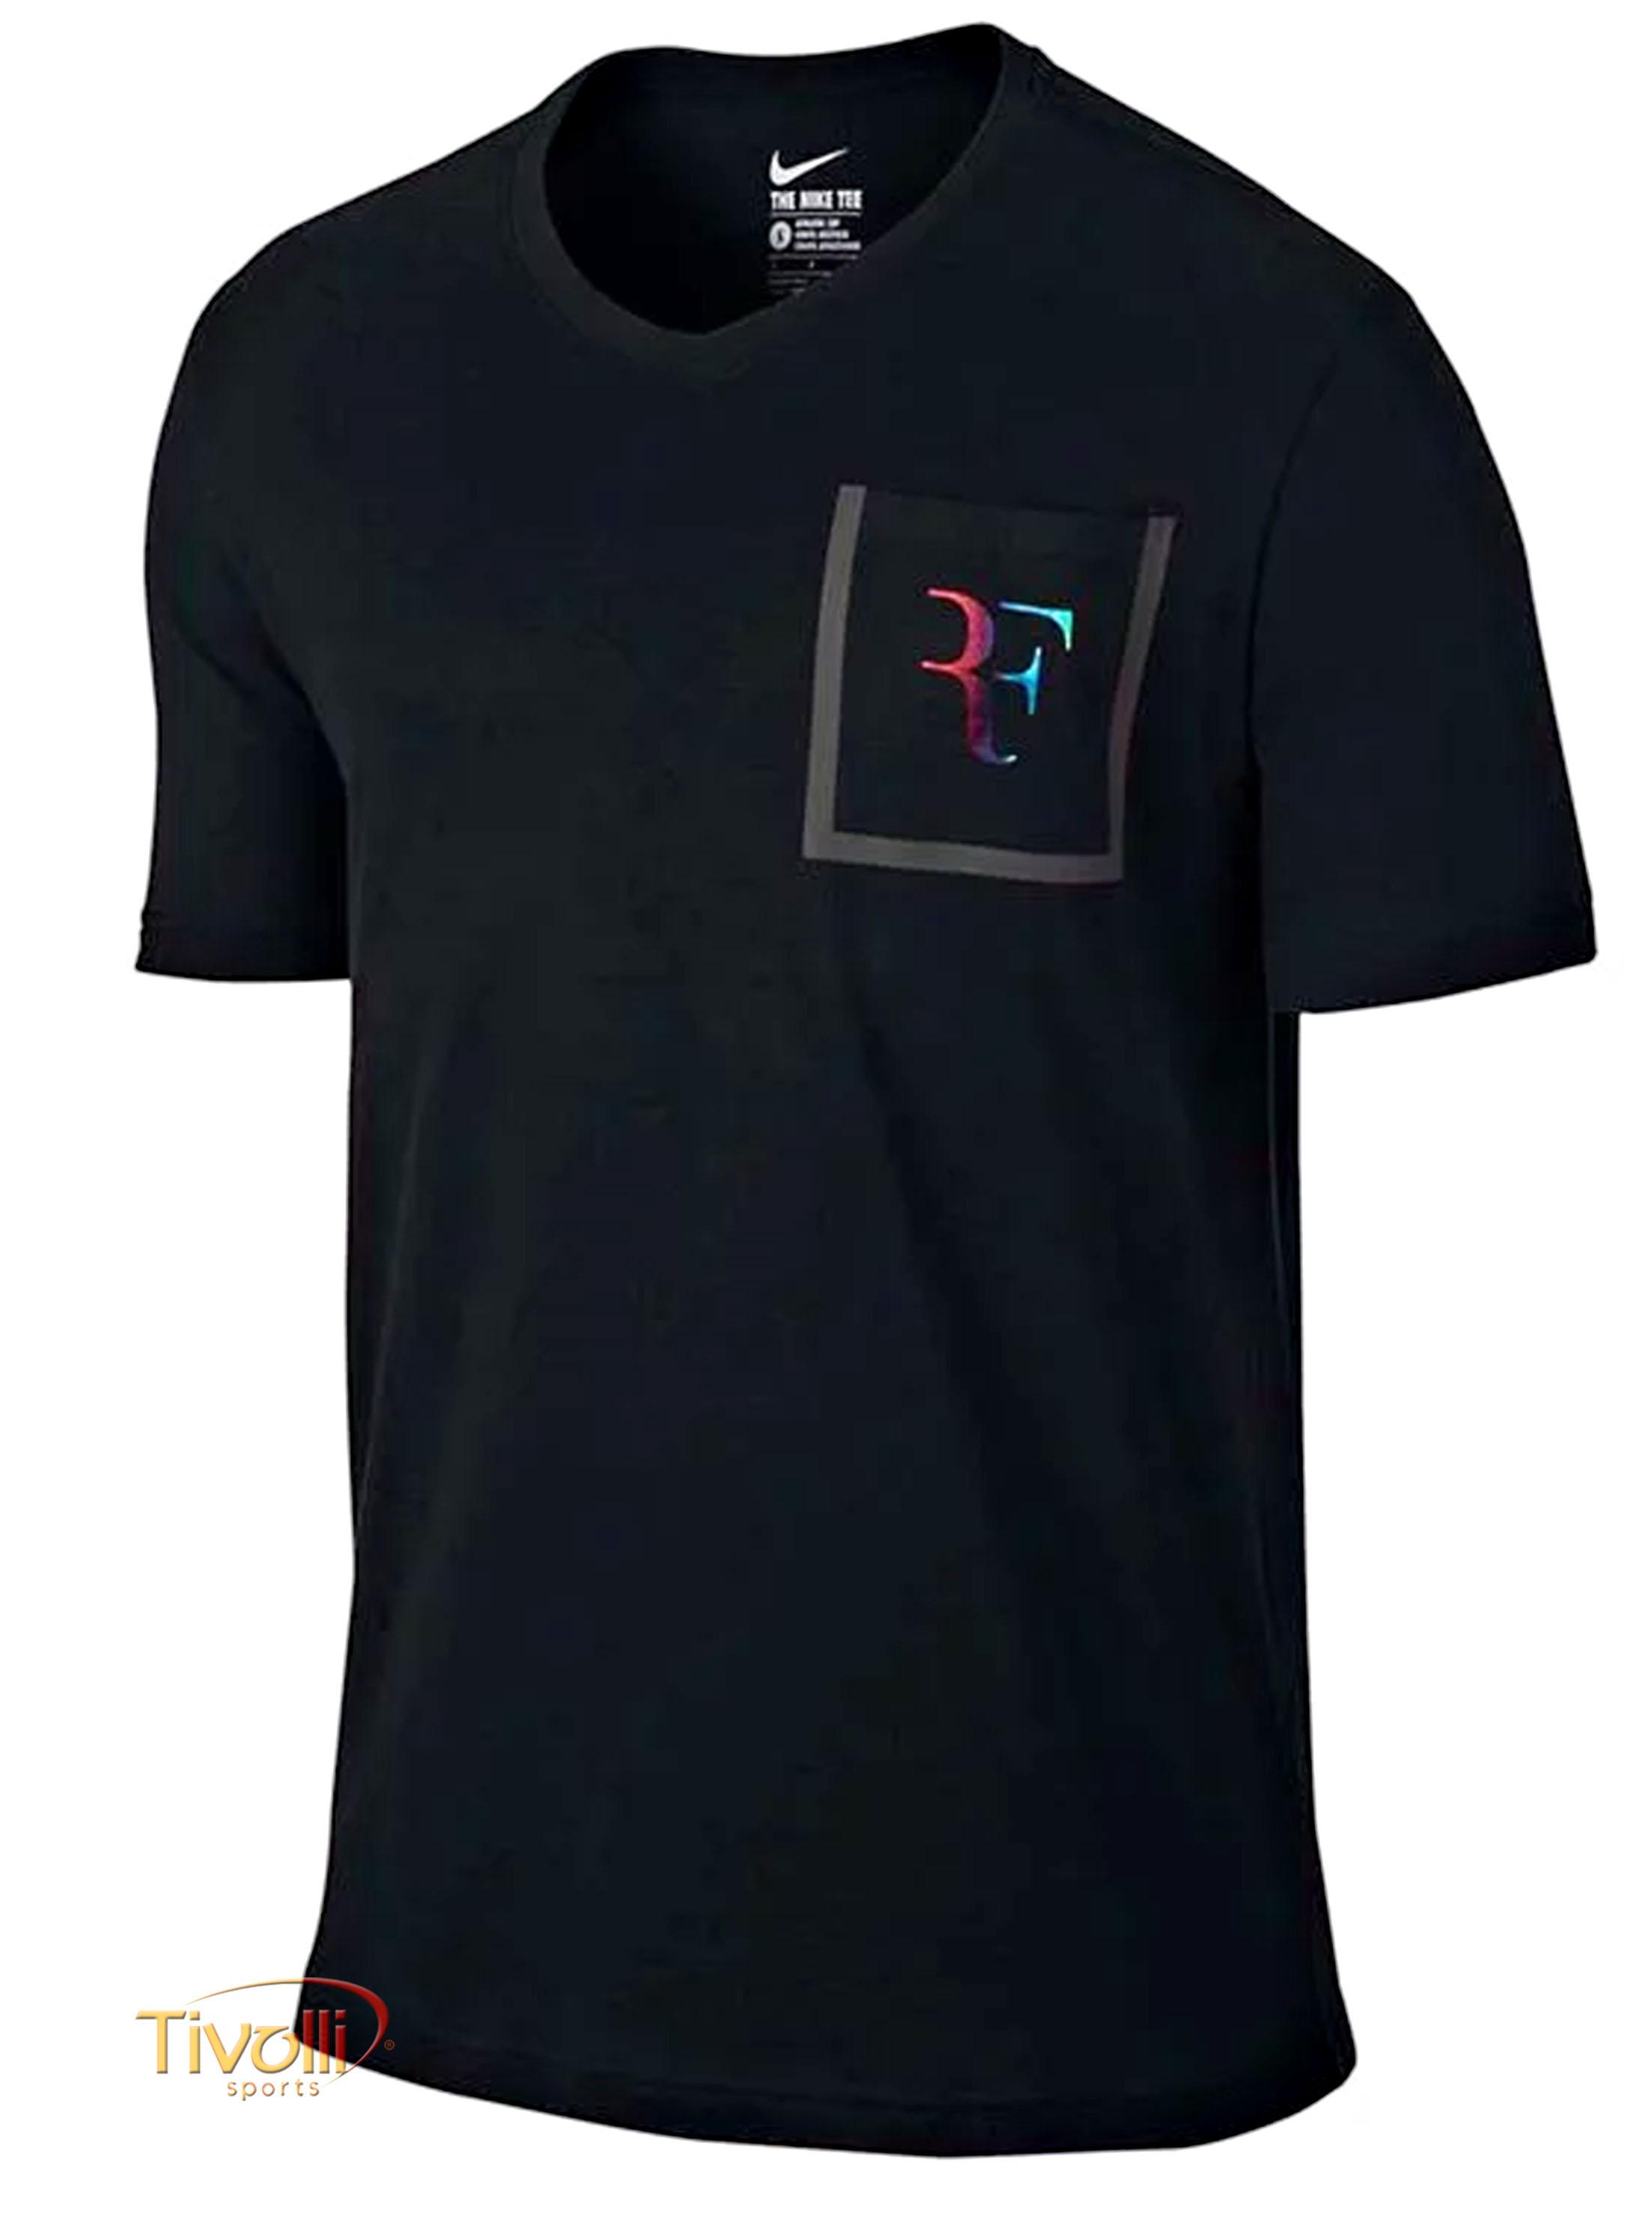 Camiseta Nike Fall RF Stealth Pocket Preta e Arco-Íris - Roger Federer -  Wimbledon 2016 74d5543798bff